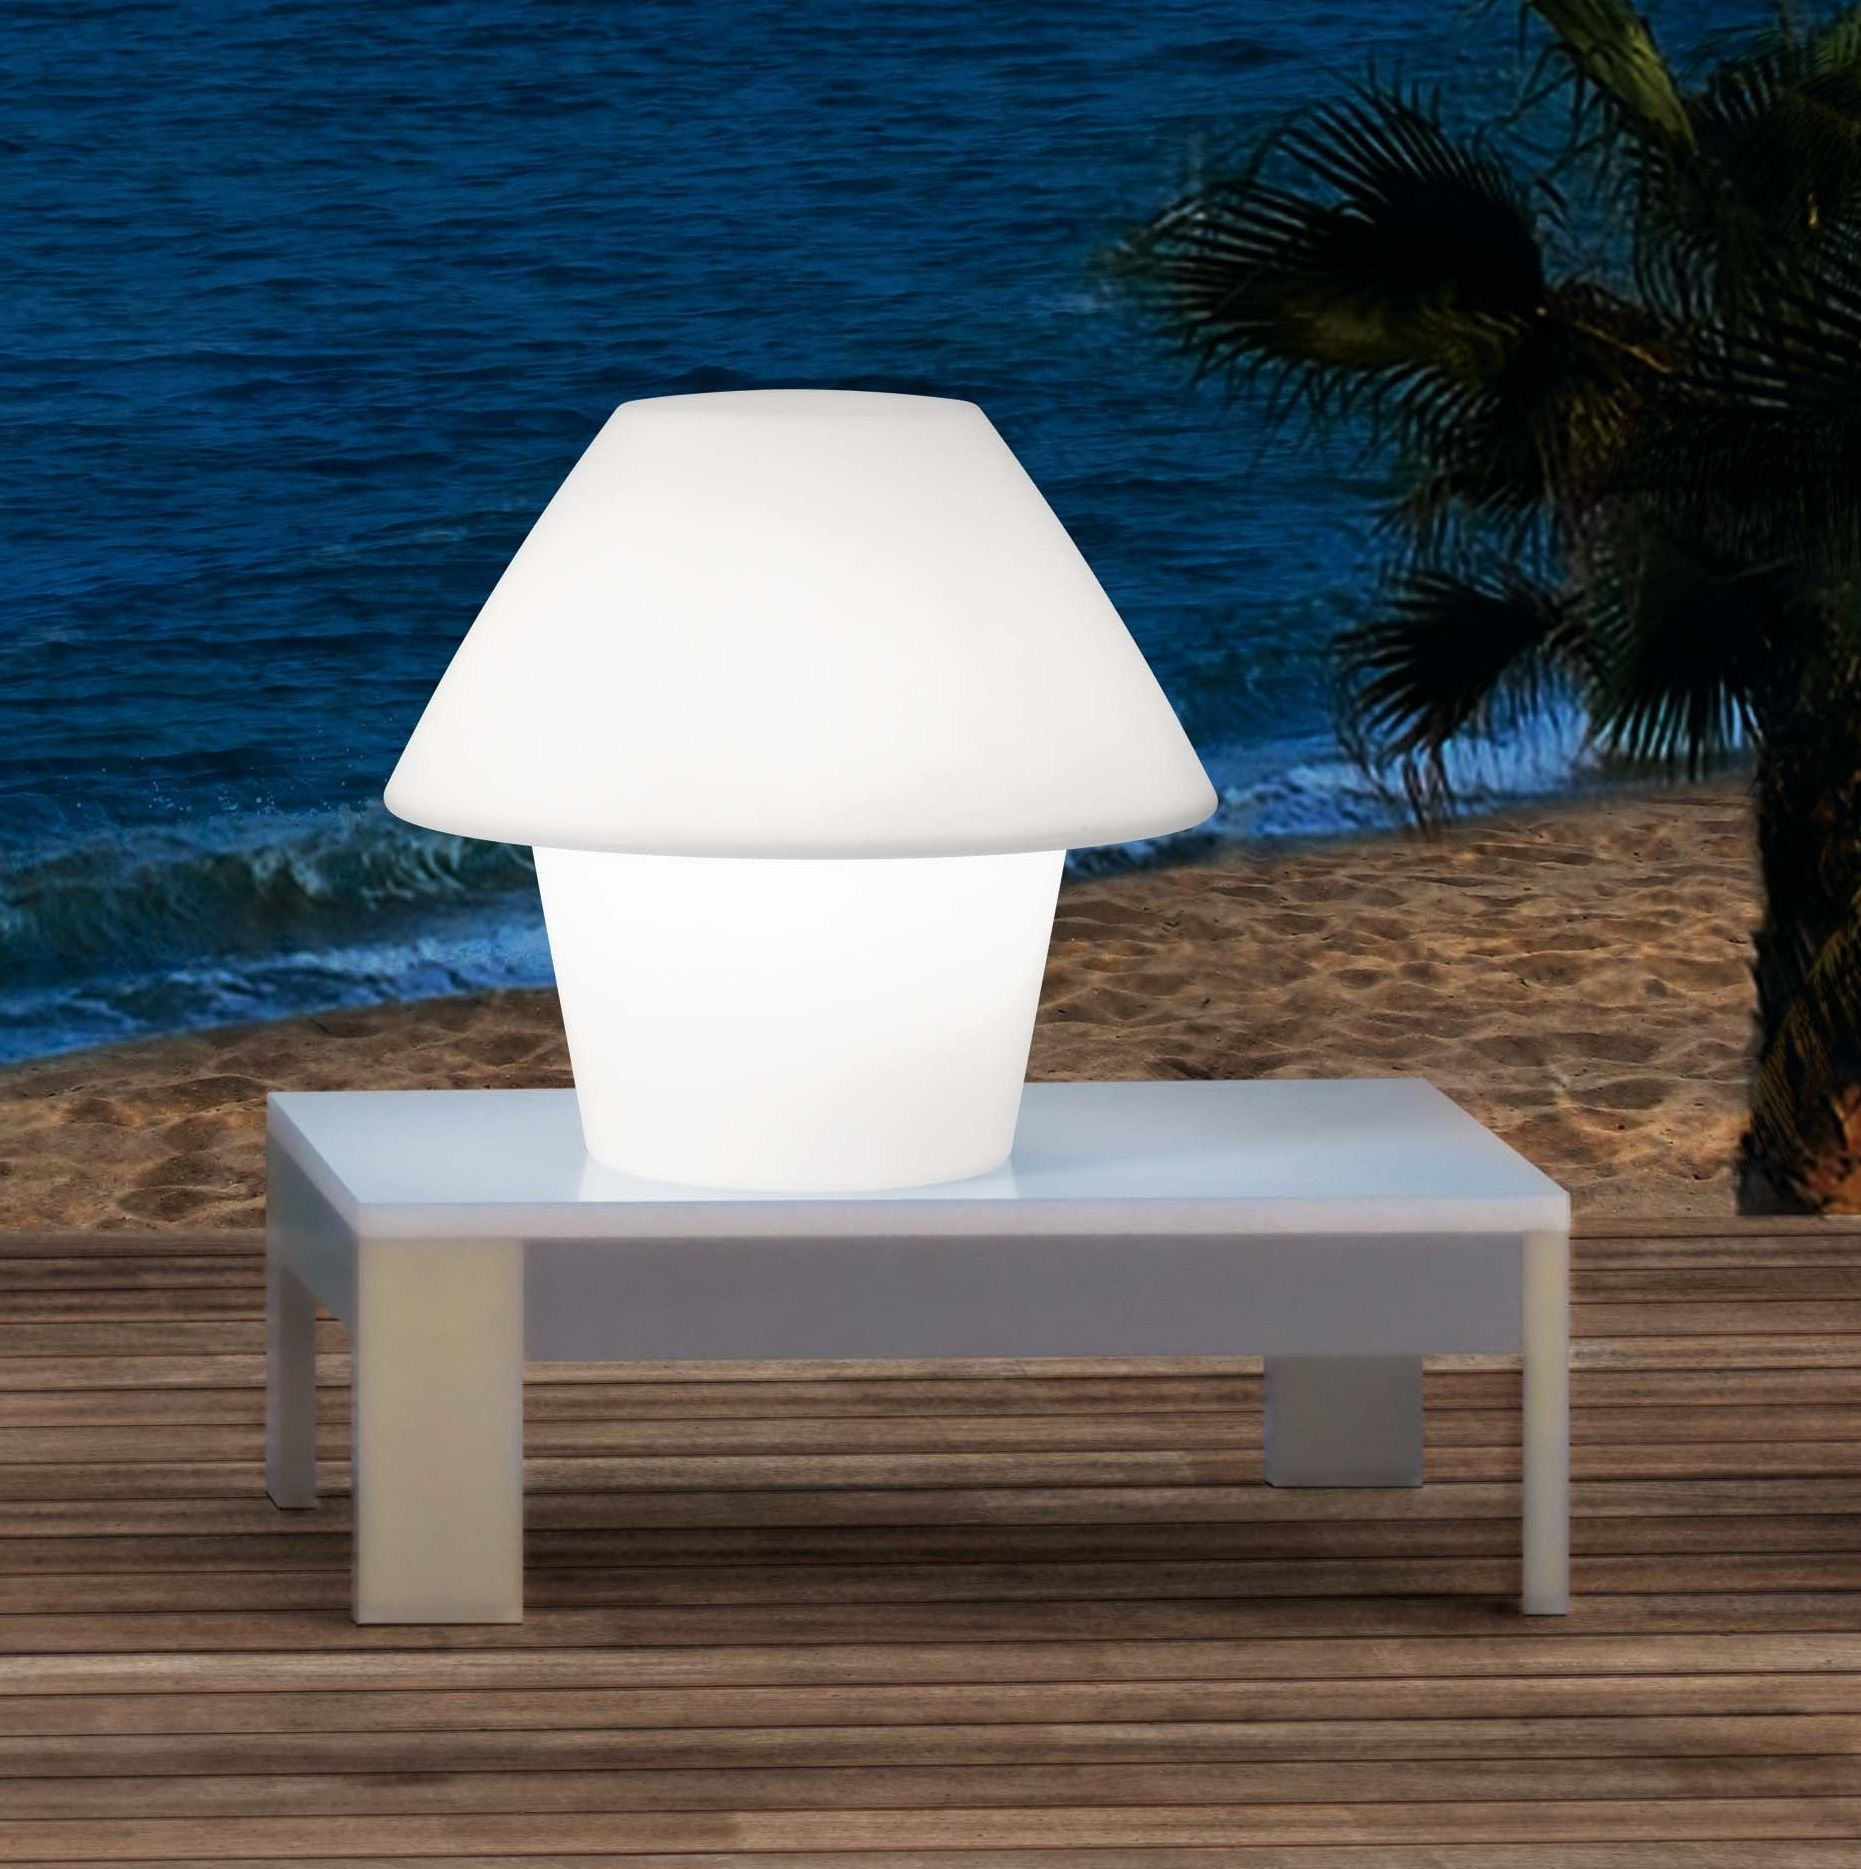 Lampe A Poser Versus Blanc O50cm Faro Eclairage De Jardin Luminaire Eclairage Exterieur